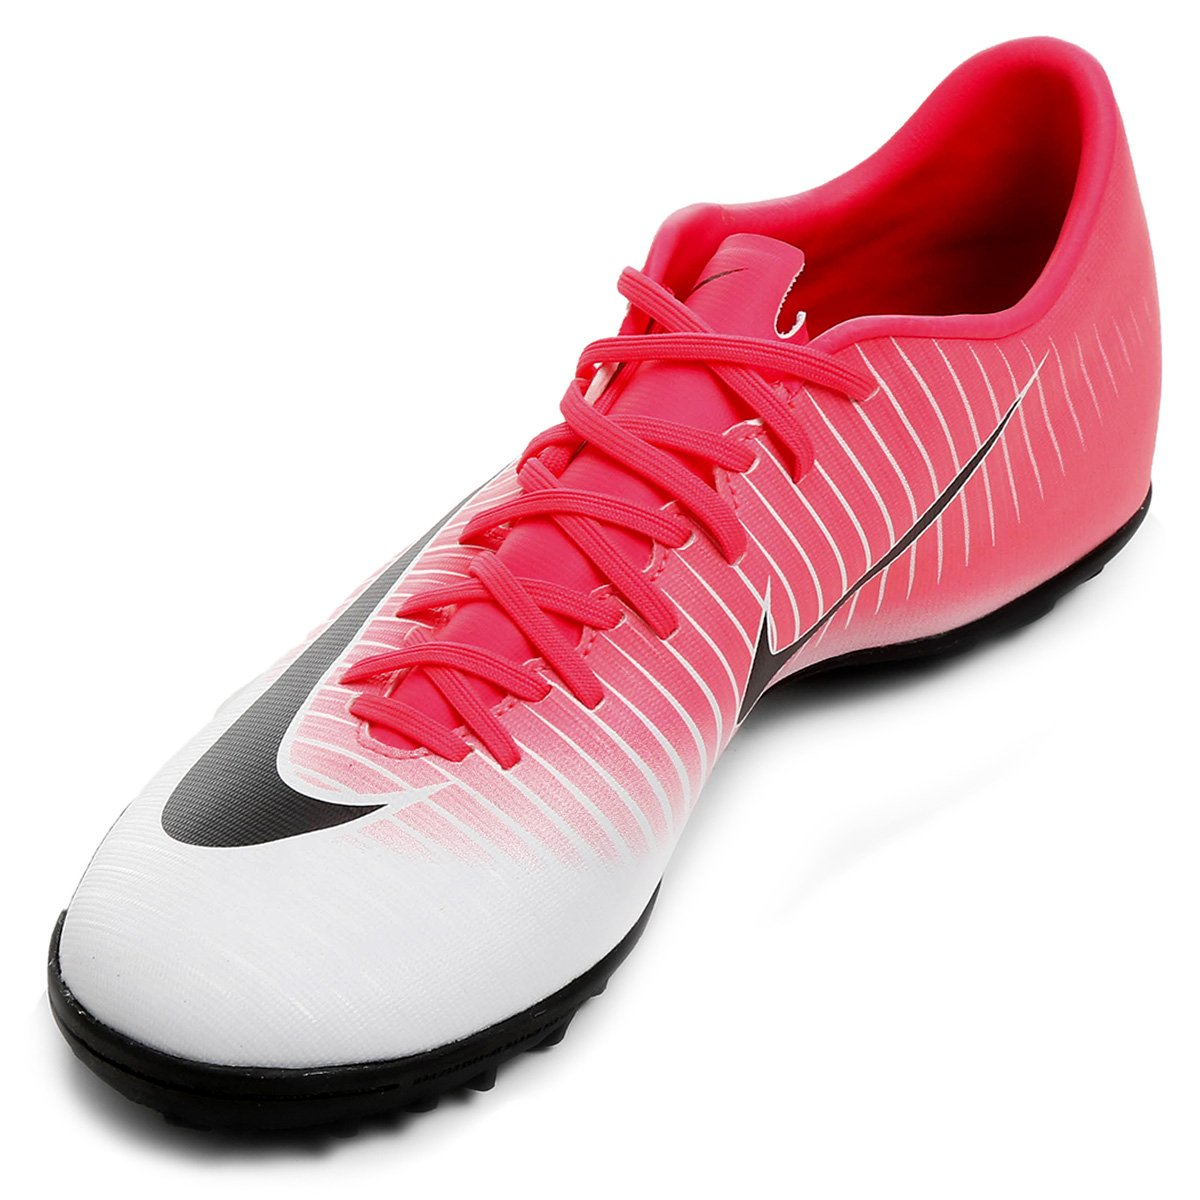 08559b3857 Chuteira Society Nike Mercurial Victory 6 TF - Pink e Preto - Compre ...